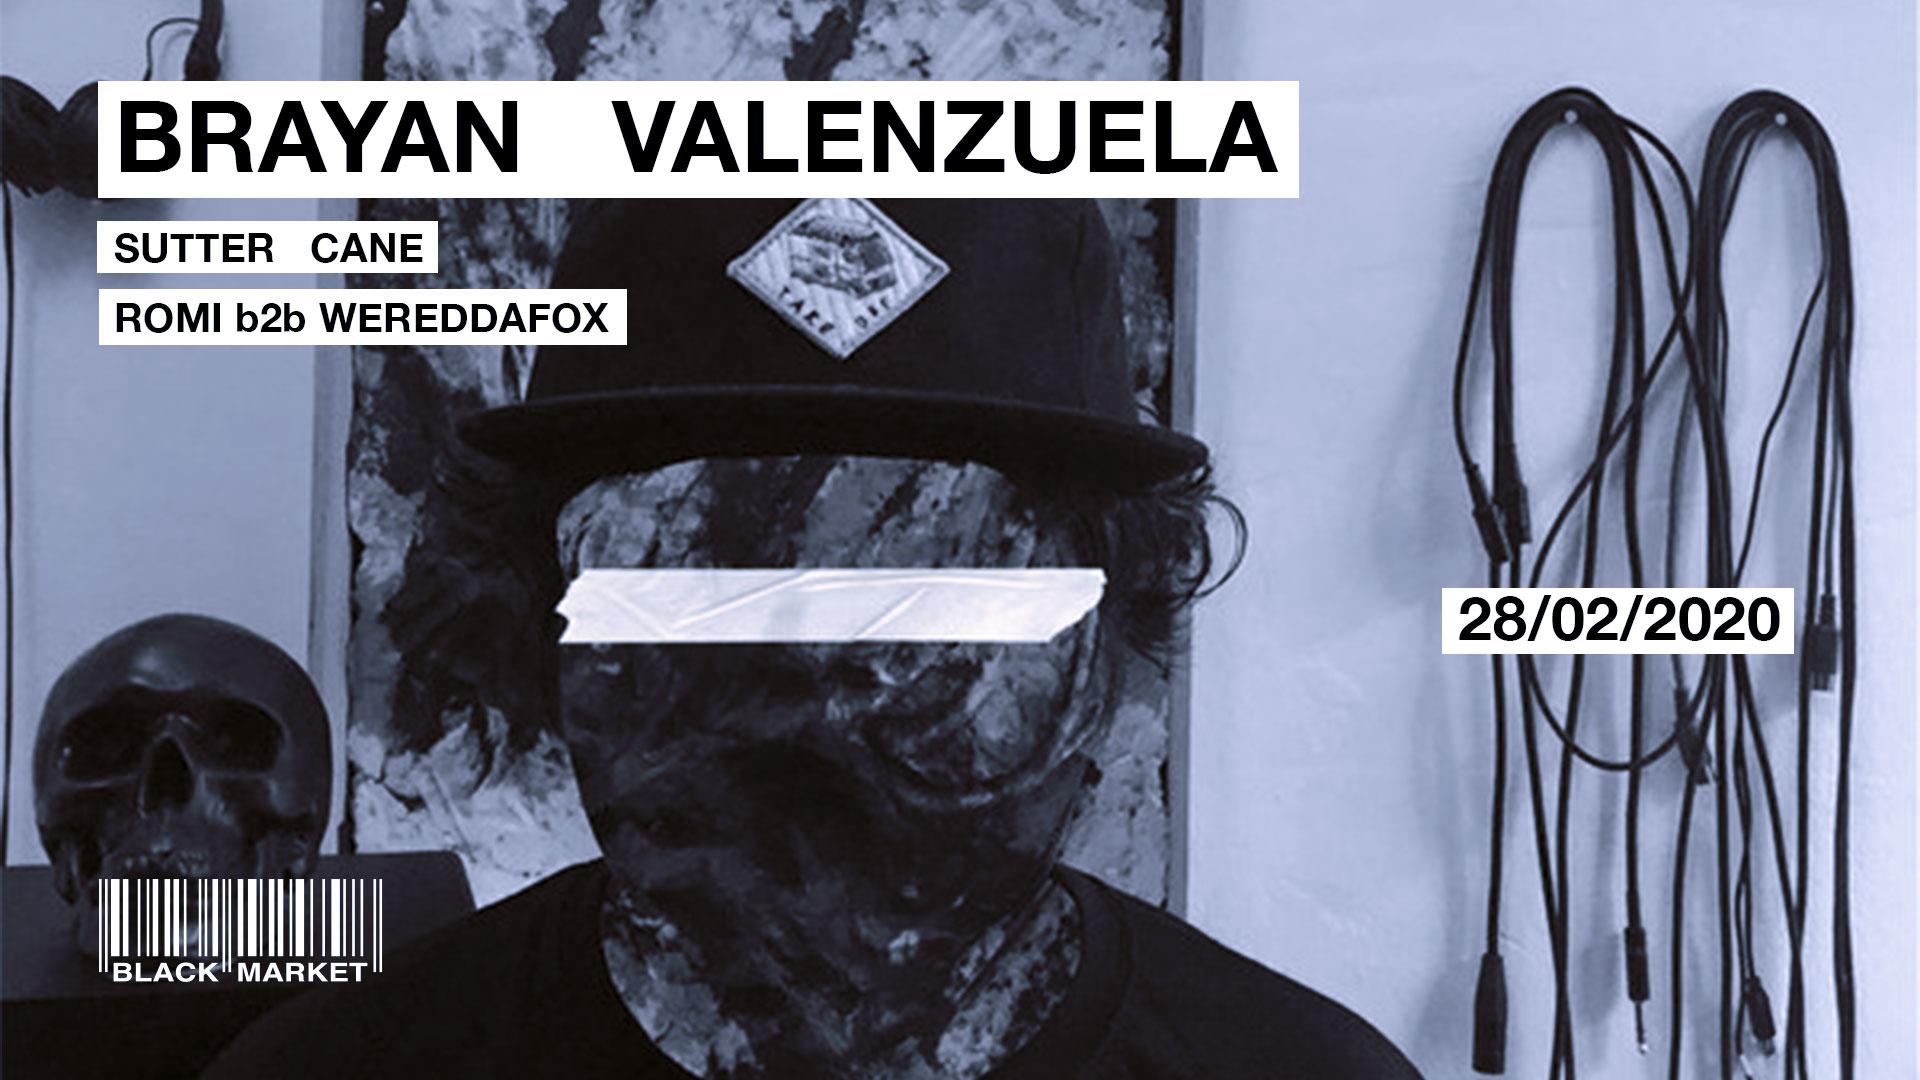 Brayan Valenzuela (Colombia) / Sutter Cane / Romi b2b Wereddafox am 28. February 2020 @ Black Market.